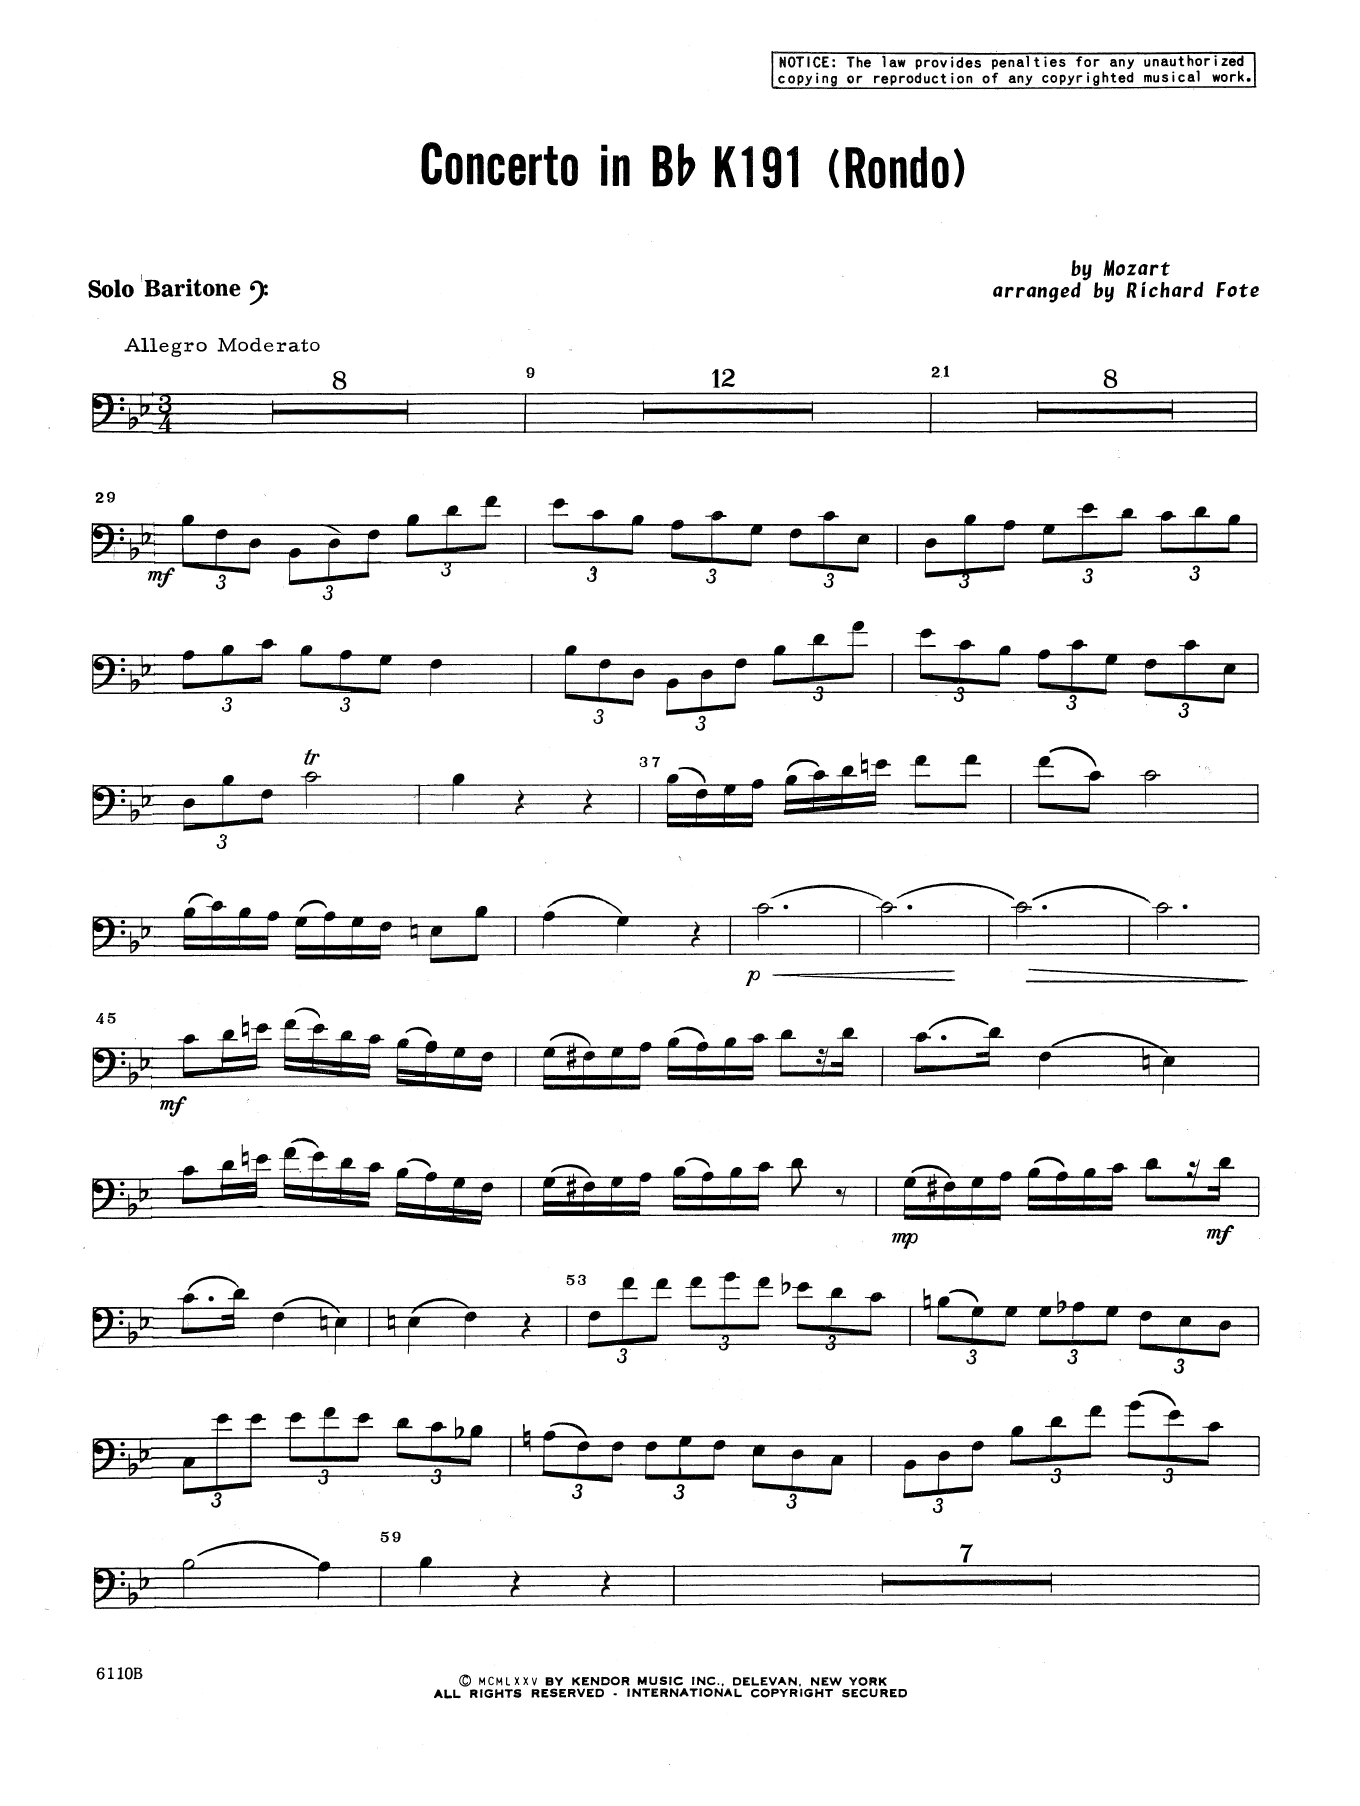 Richard Fote Concerto In Bb K191 (Rondo) - Baritone B.C. sheet music notes and chords. Download Printable PDF.